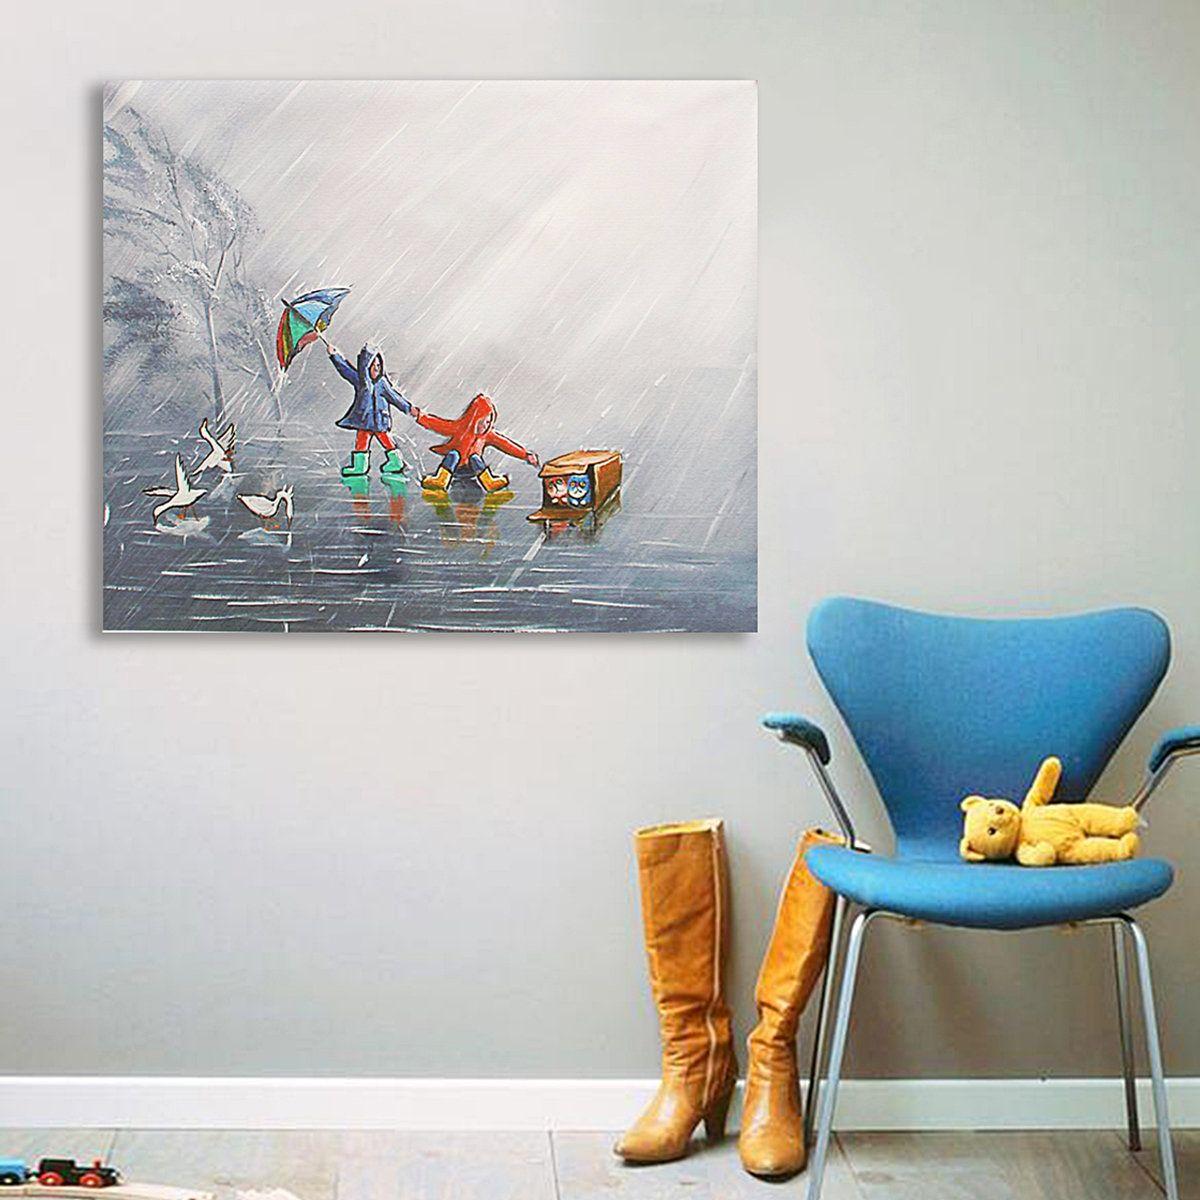 Modern abstract canvas painting frameless wall art kids bedroom